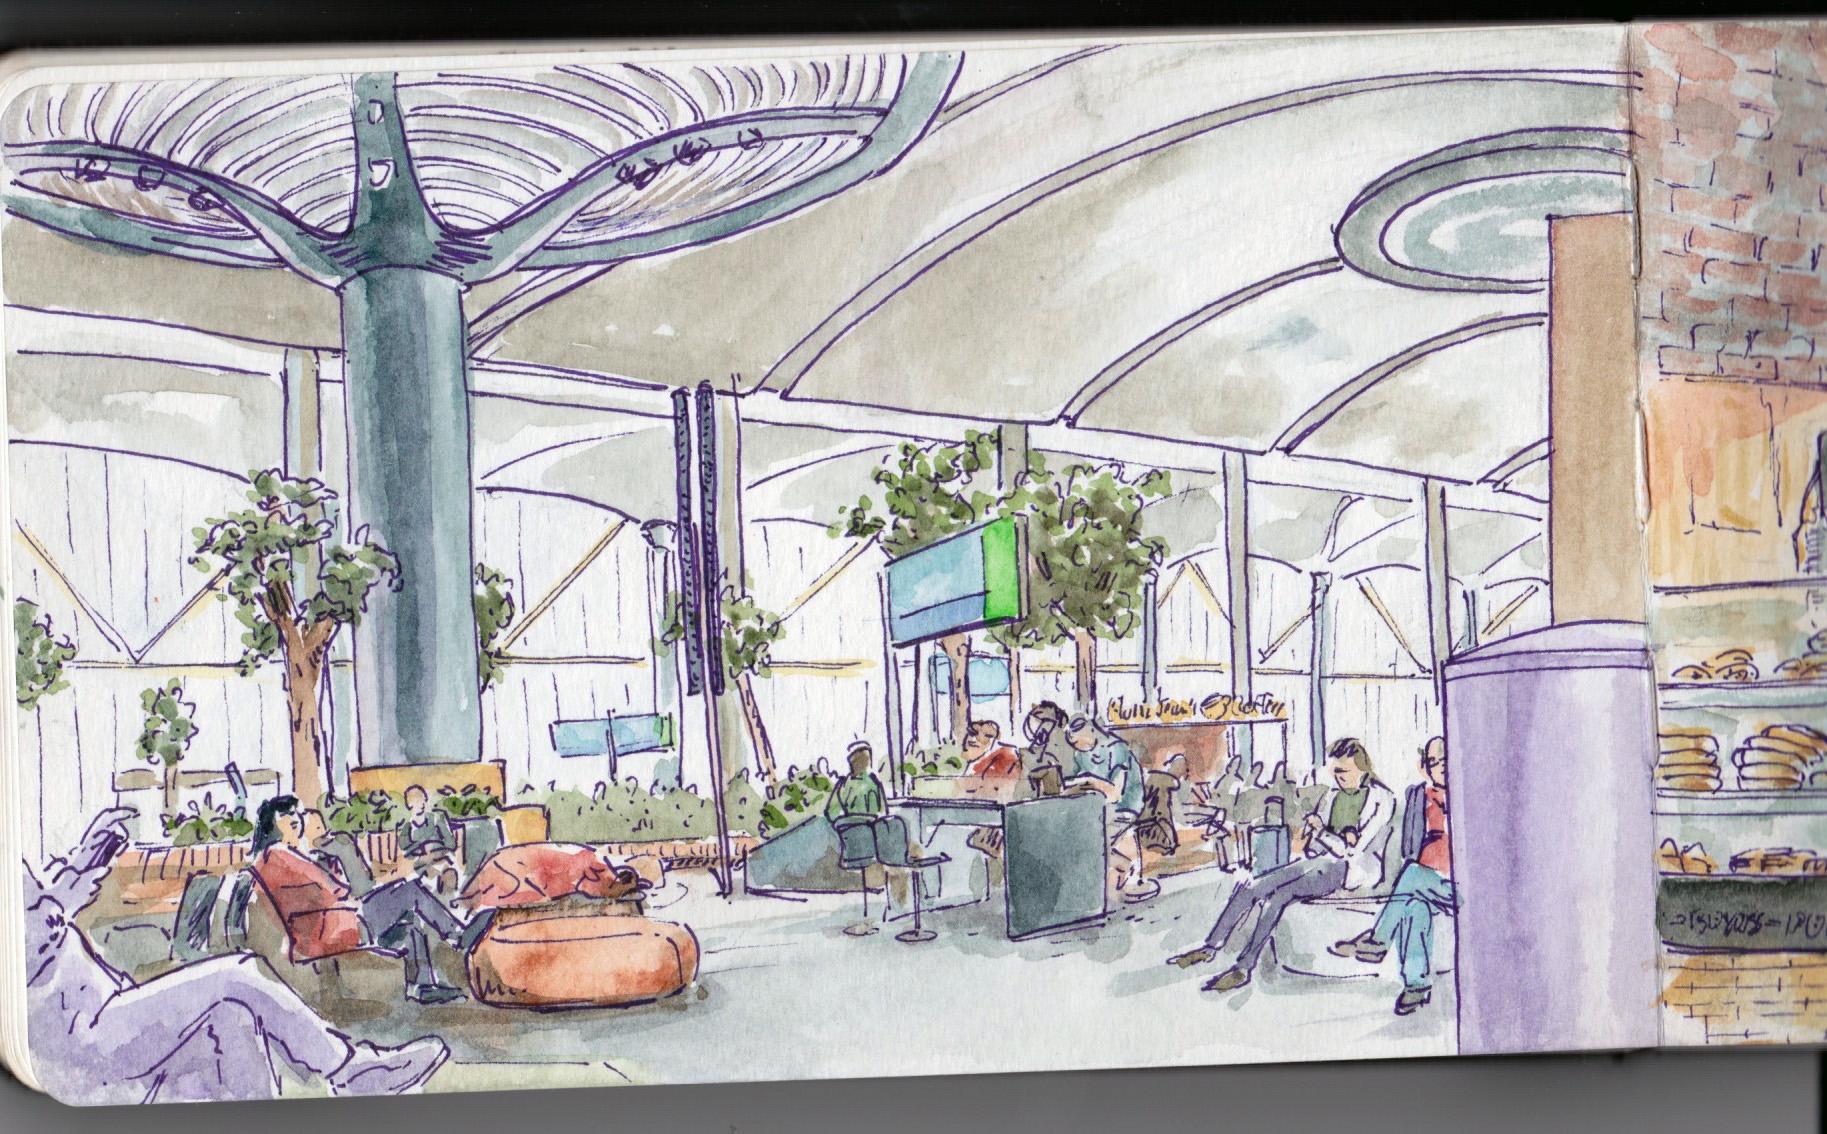 Aéroport d'Istambul